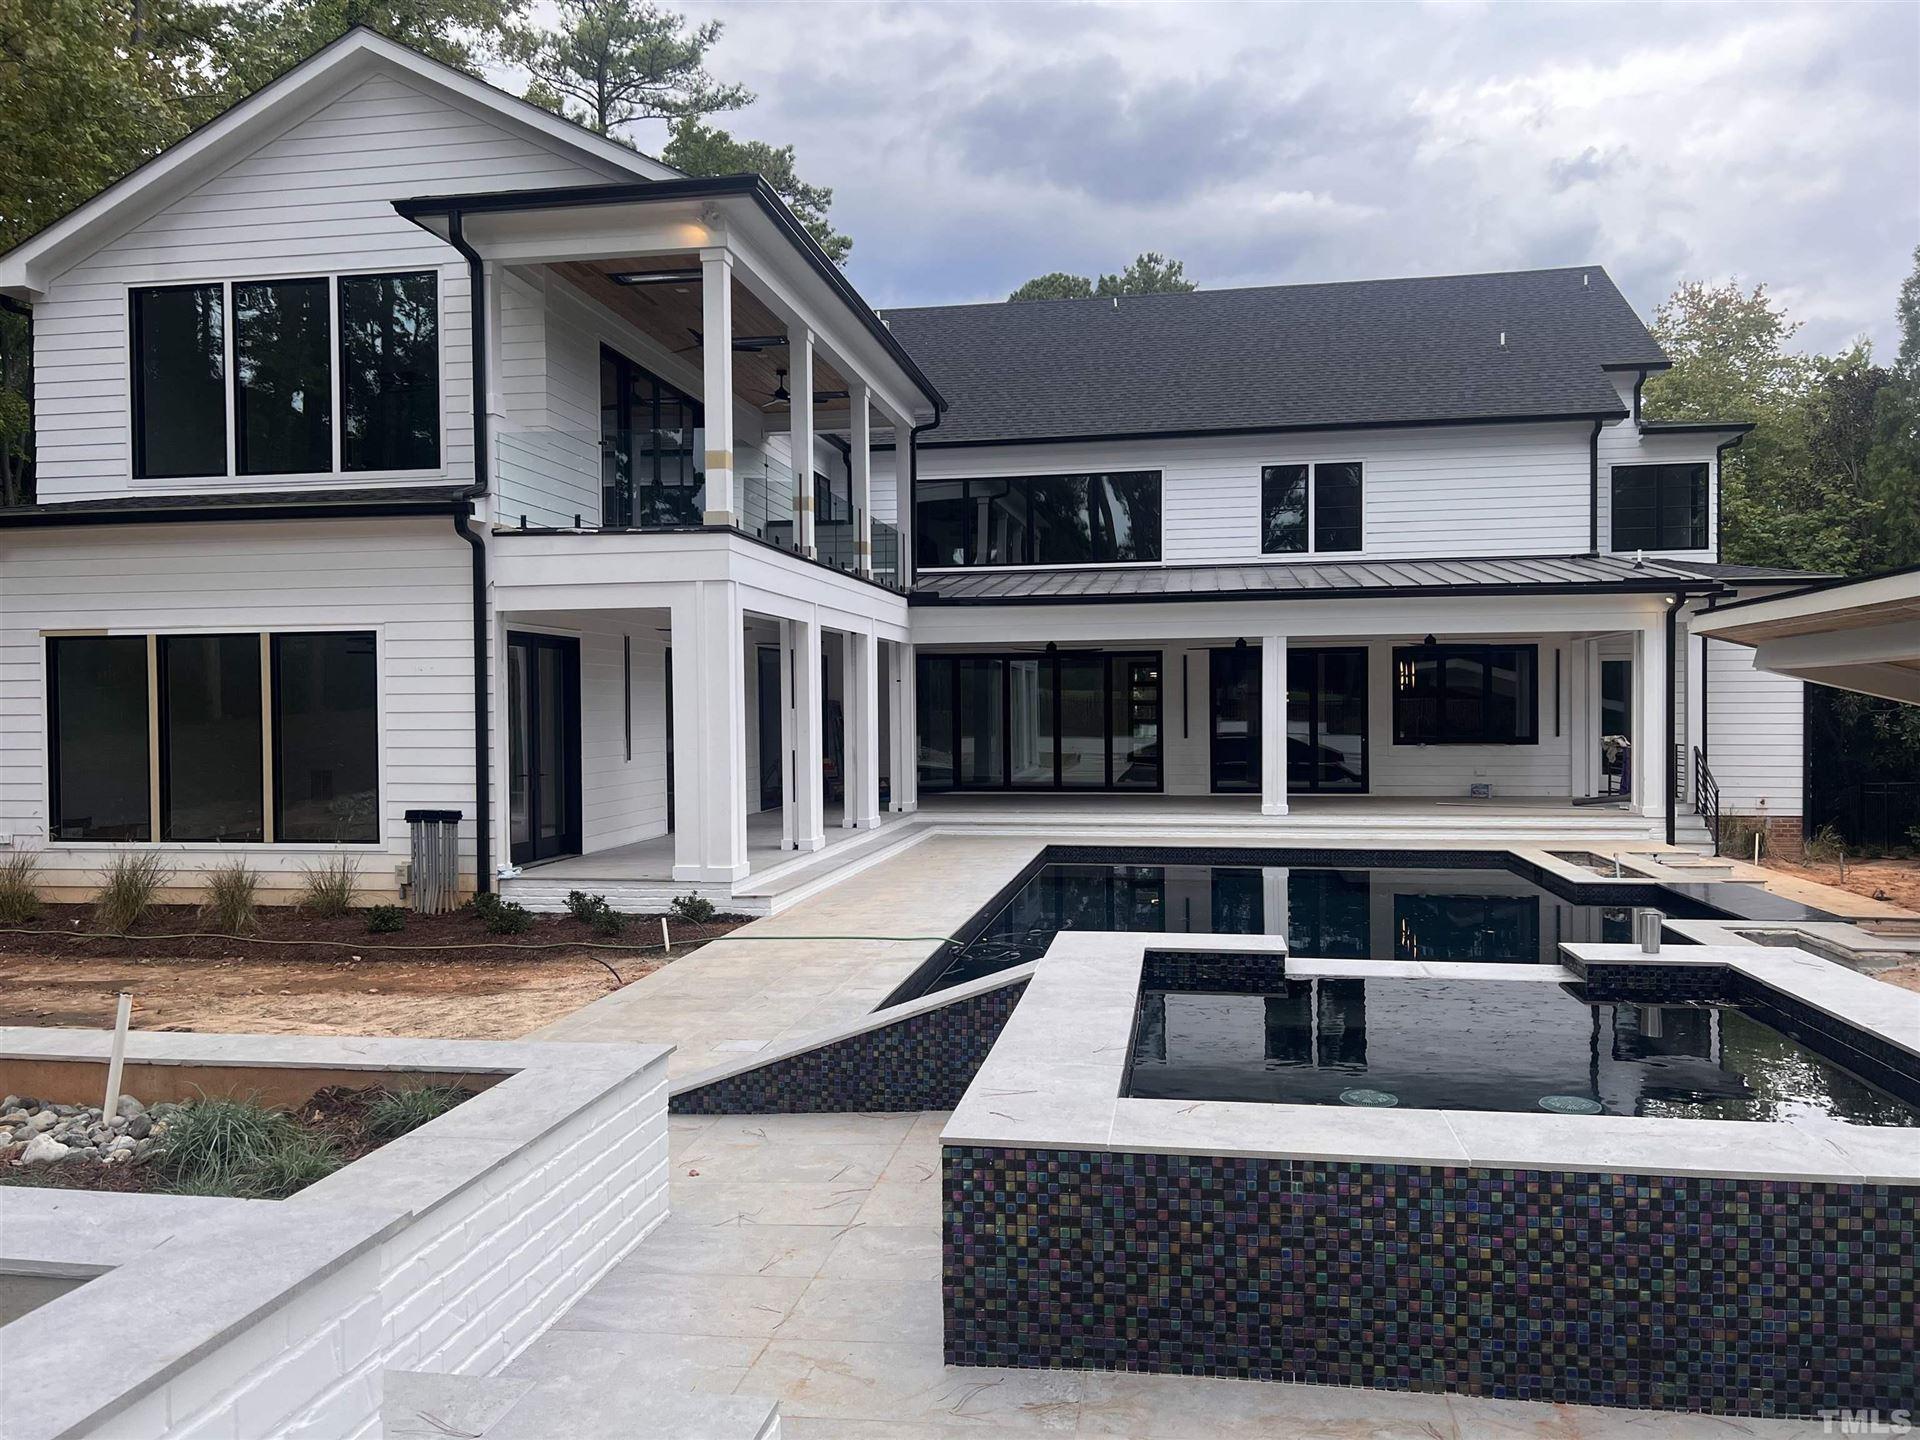 Photo of 1616 Hunting Ridge Road, Raleigh, NC 27615 (MLS # 2378933)